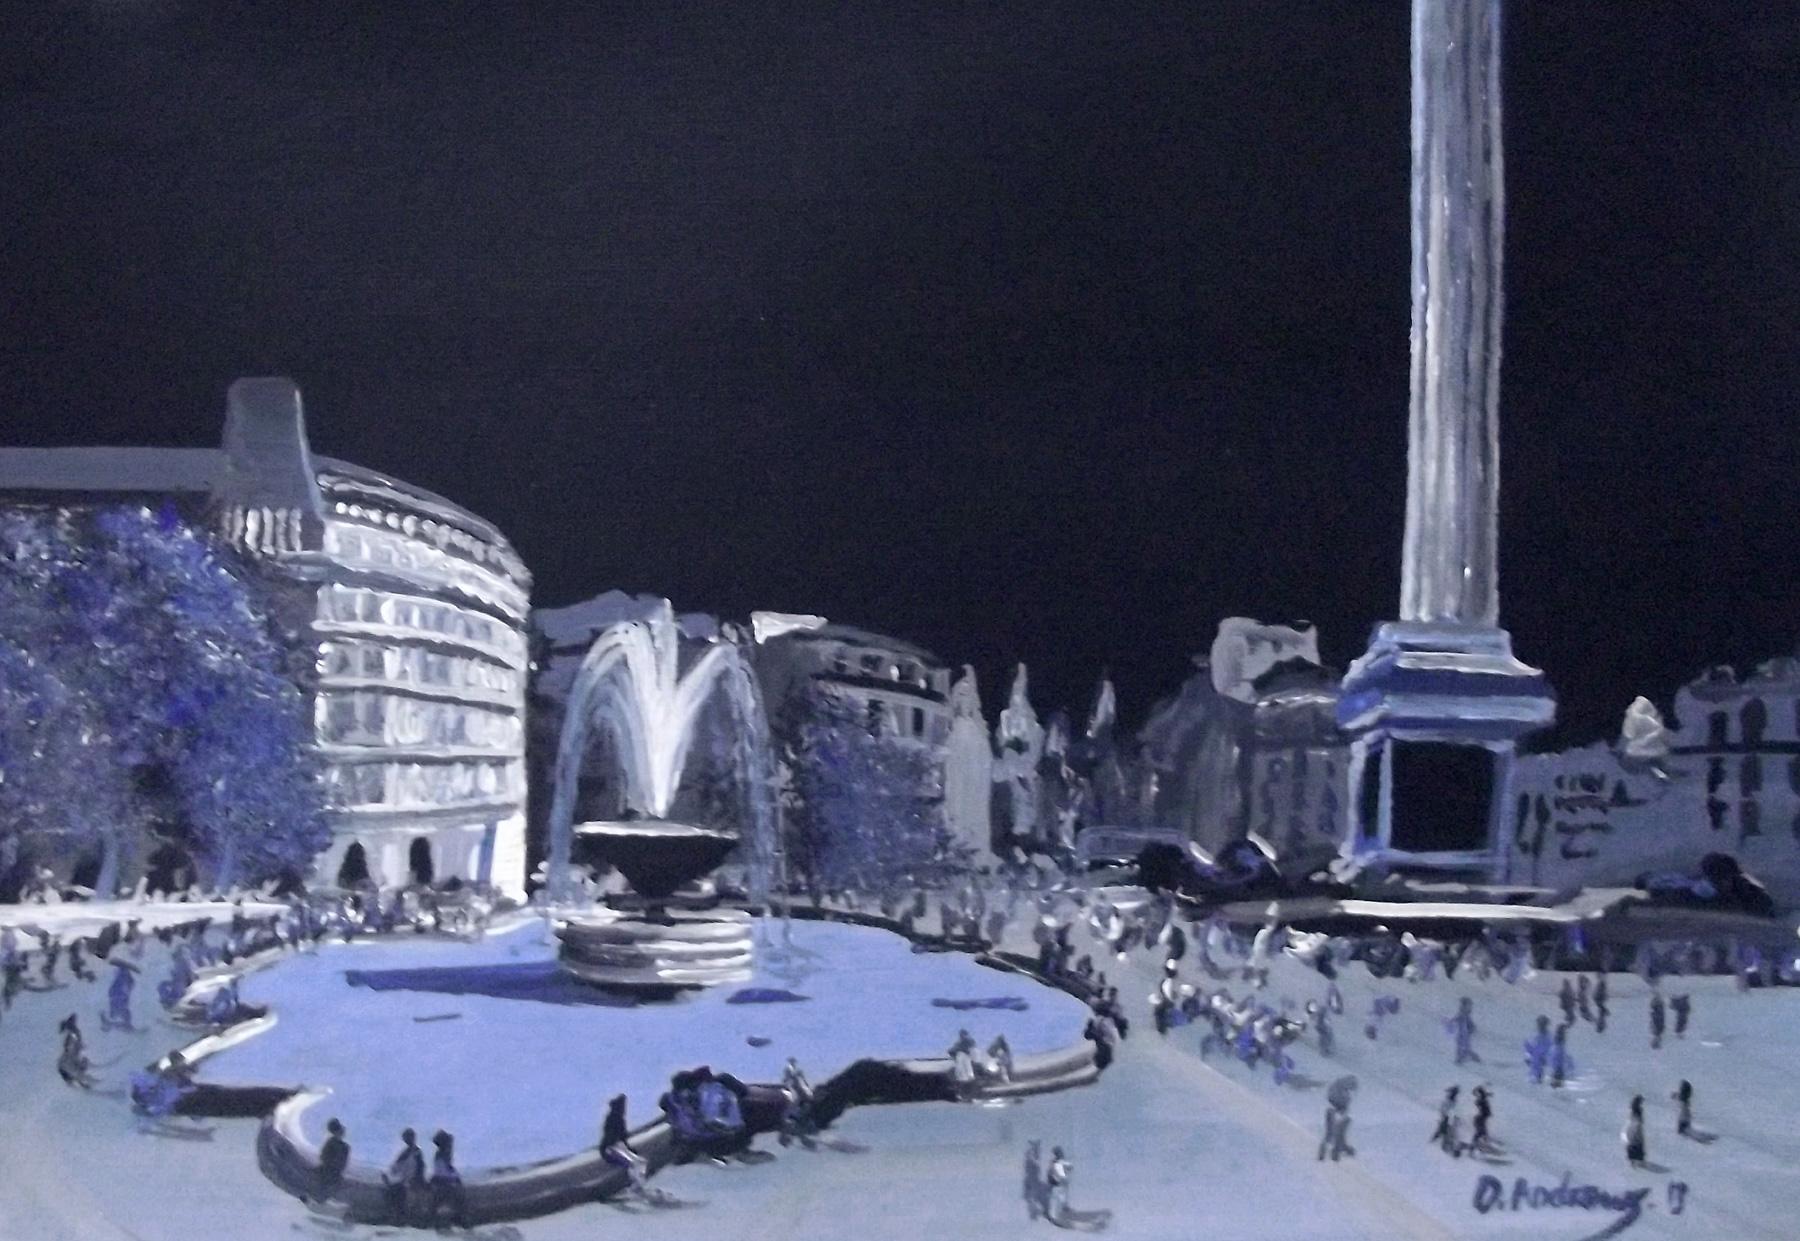 trafalgar square at night painting by darren andrews